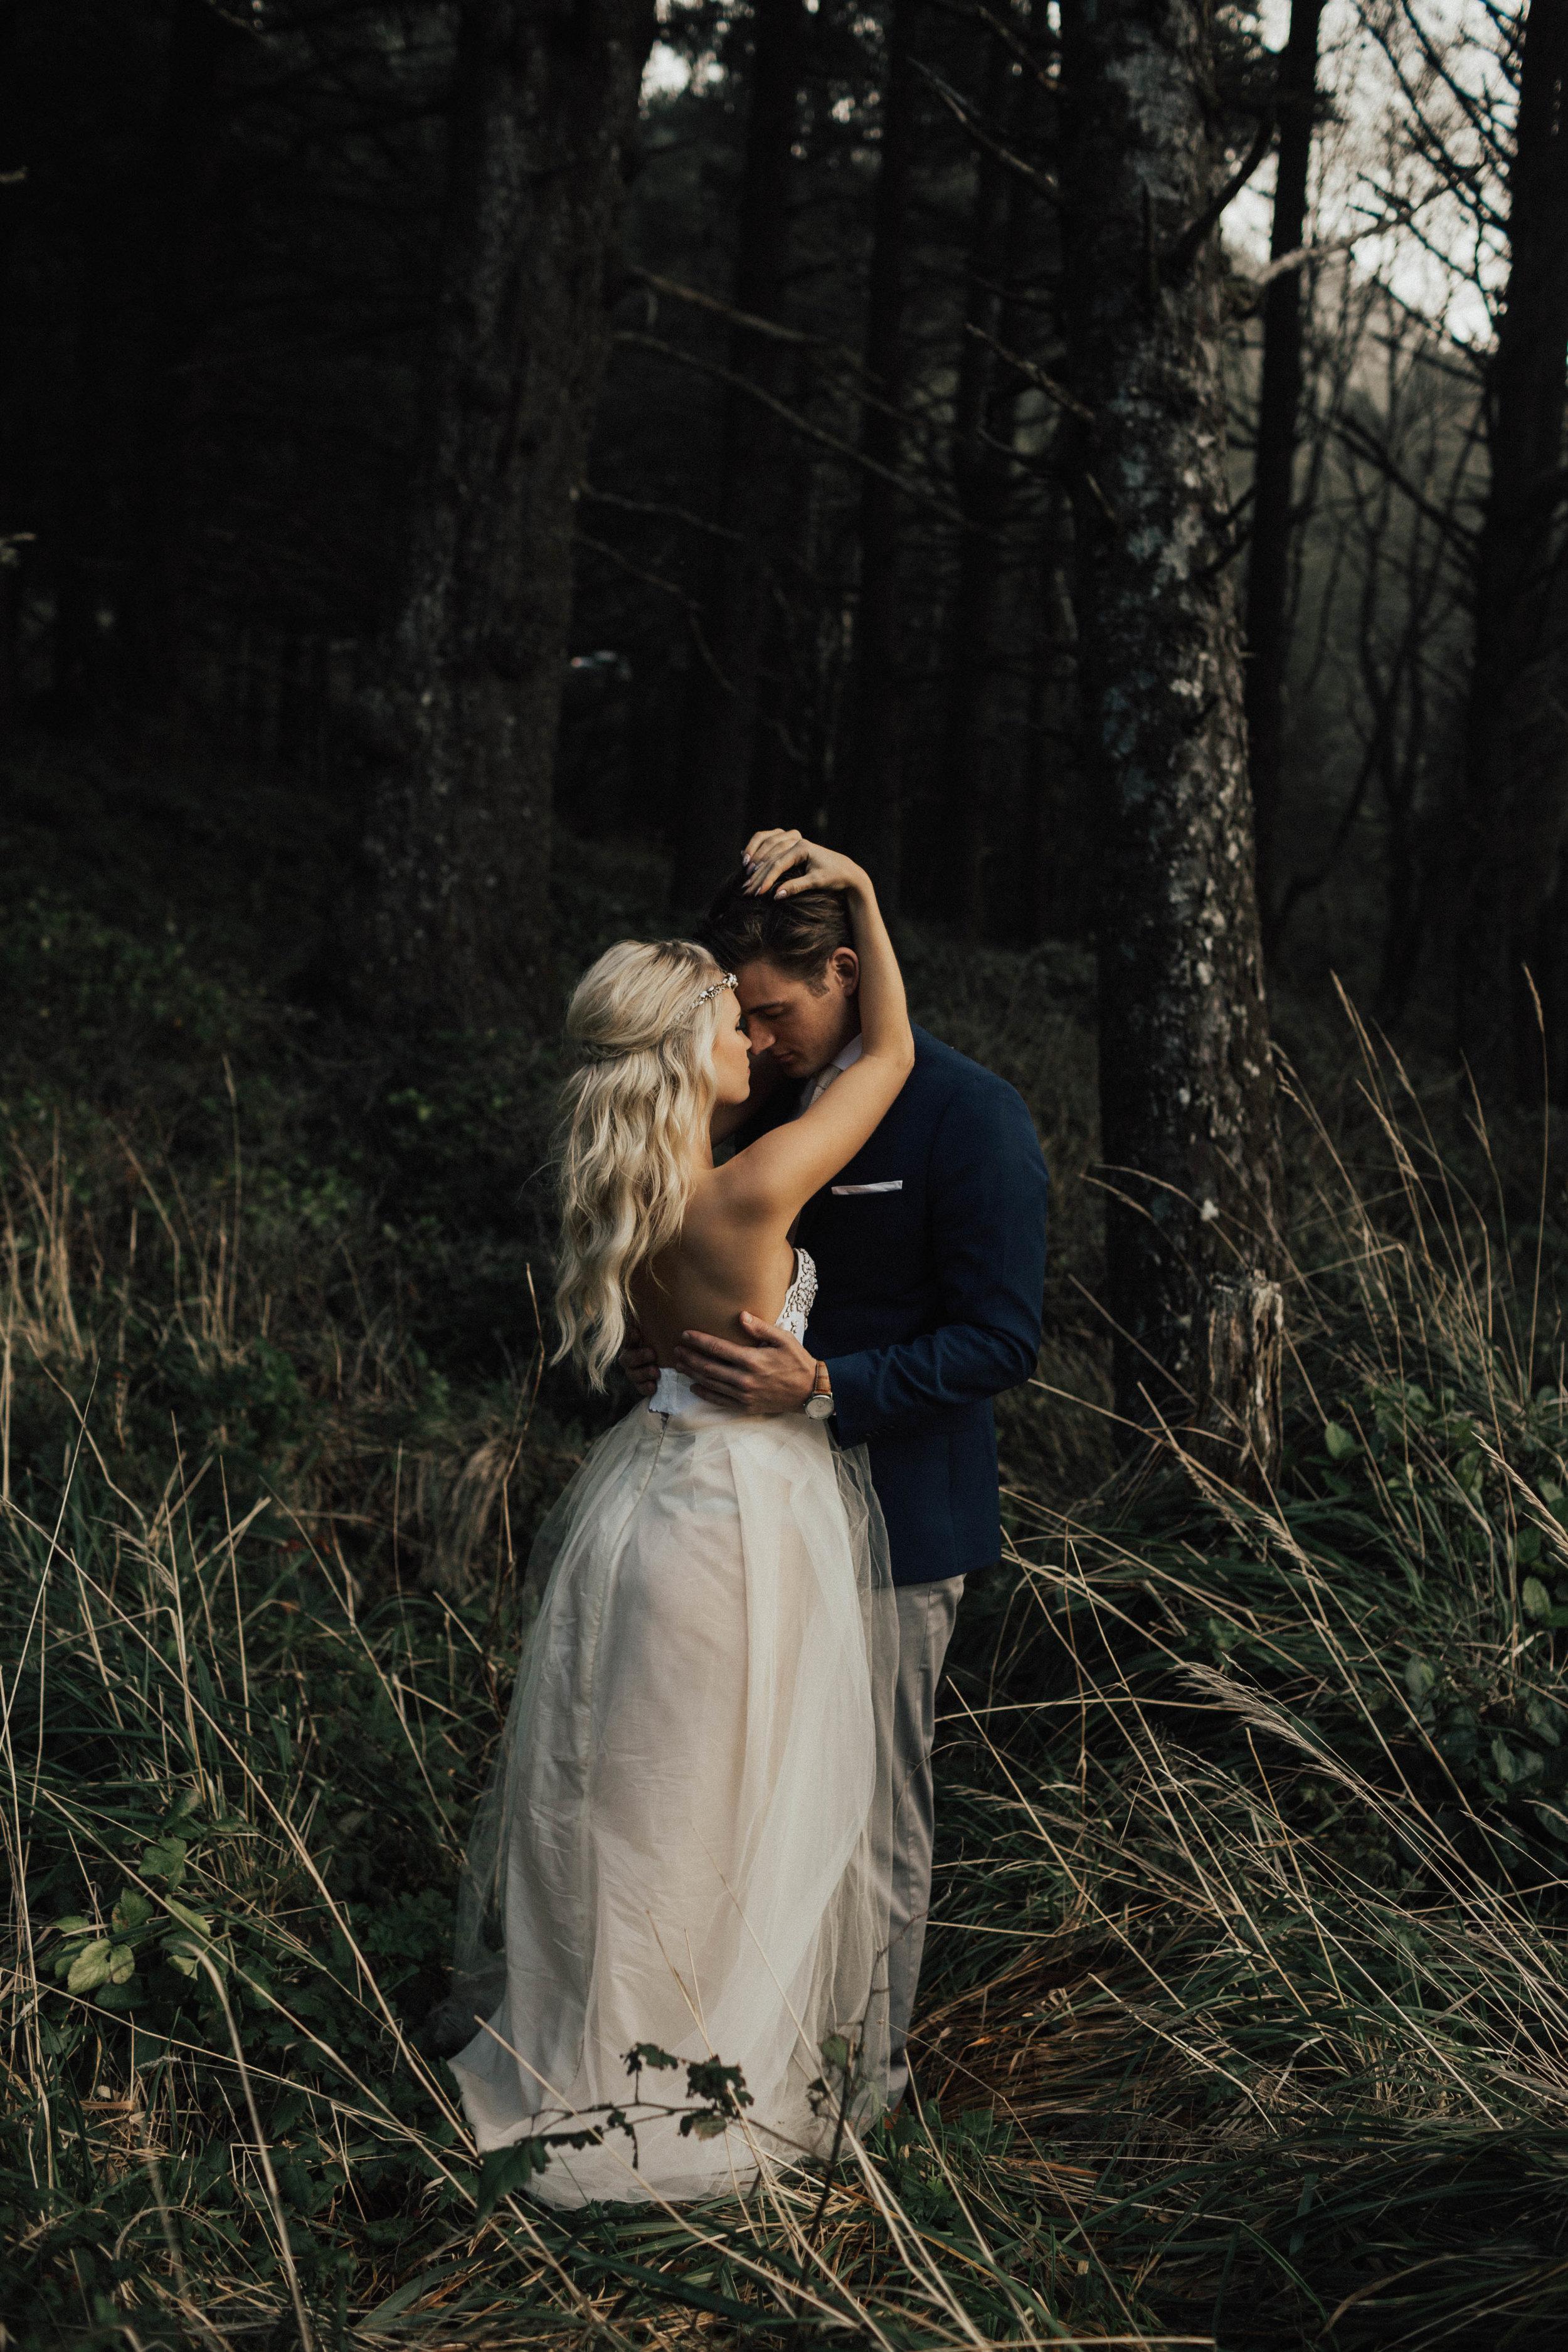 Hug Point Oregon Elopement - Michelle Larmand Photography -001